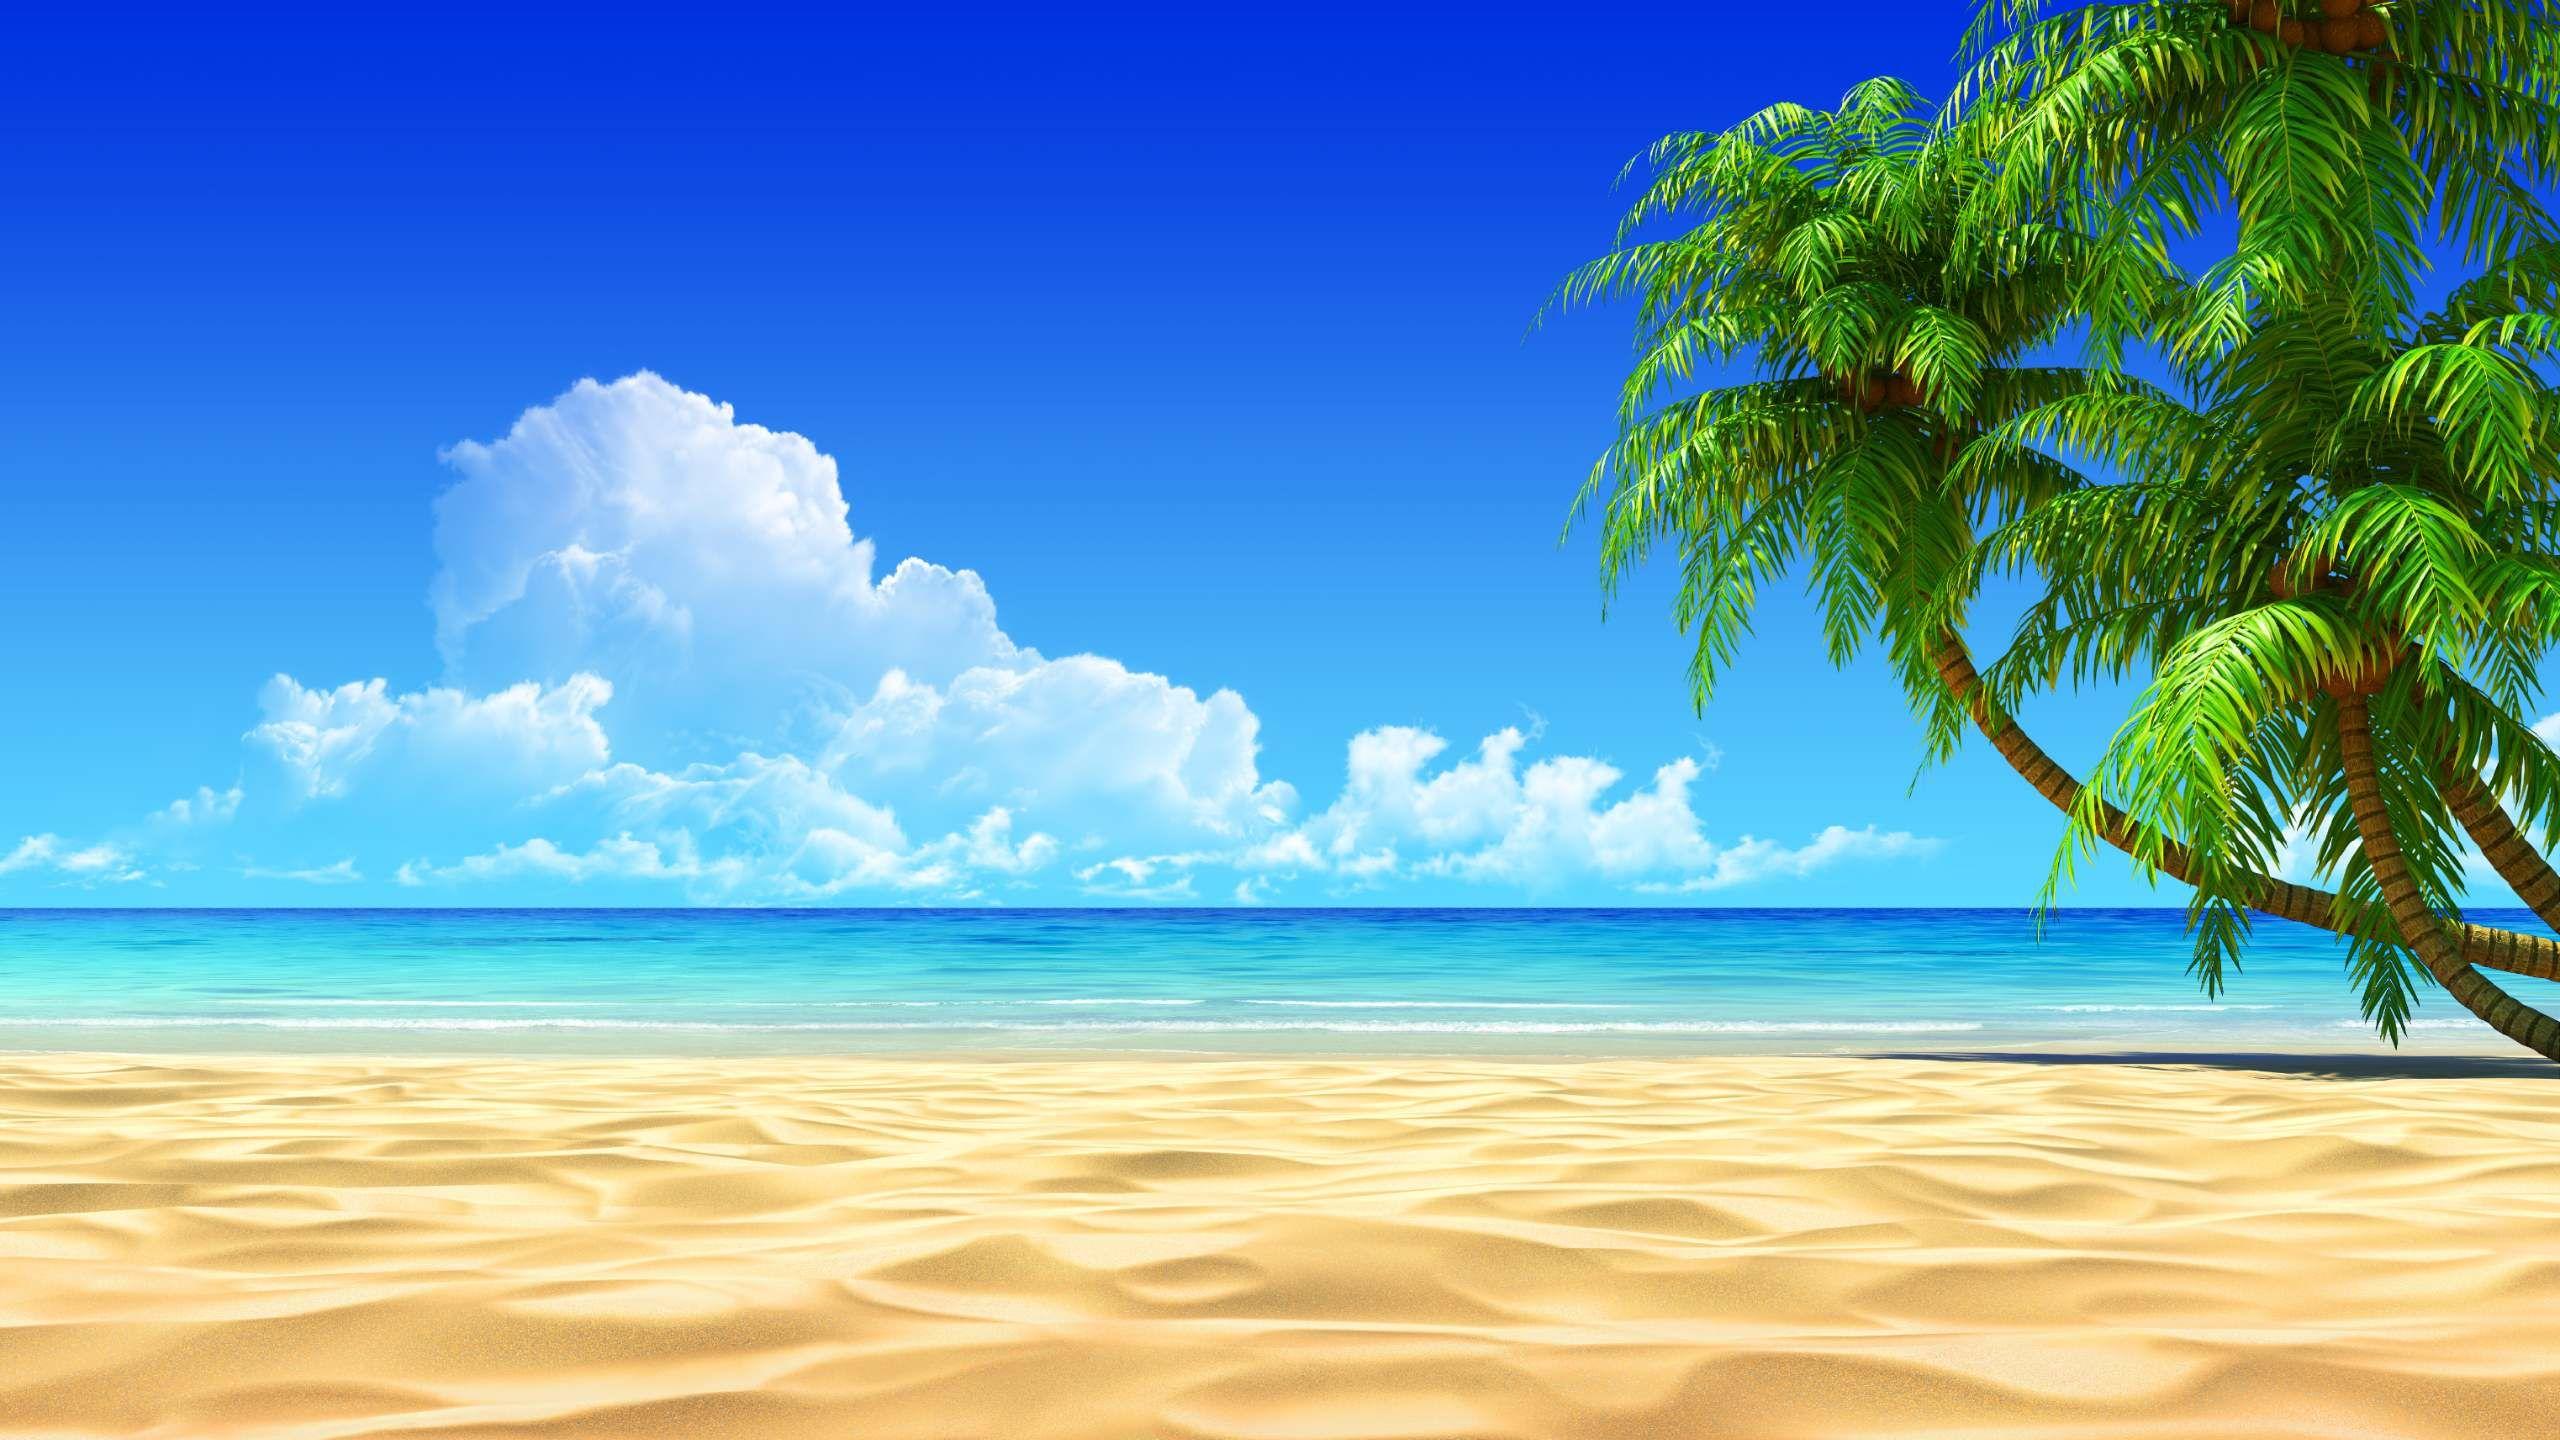 free widescreen wallpaper downloads awesome tropical beach desktop 2560x1440